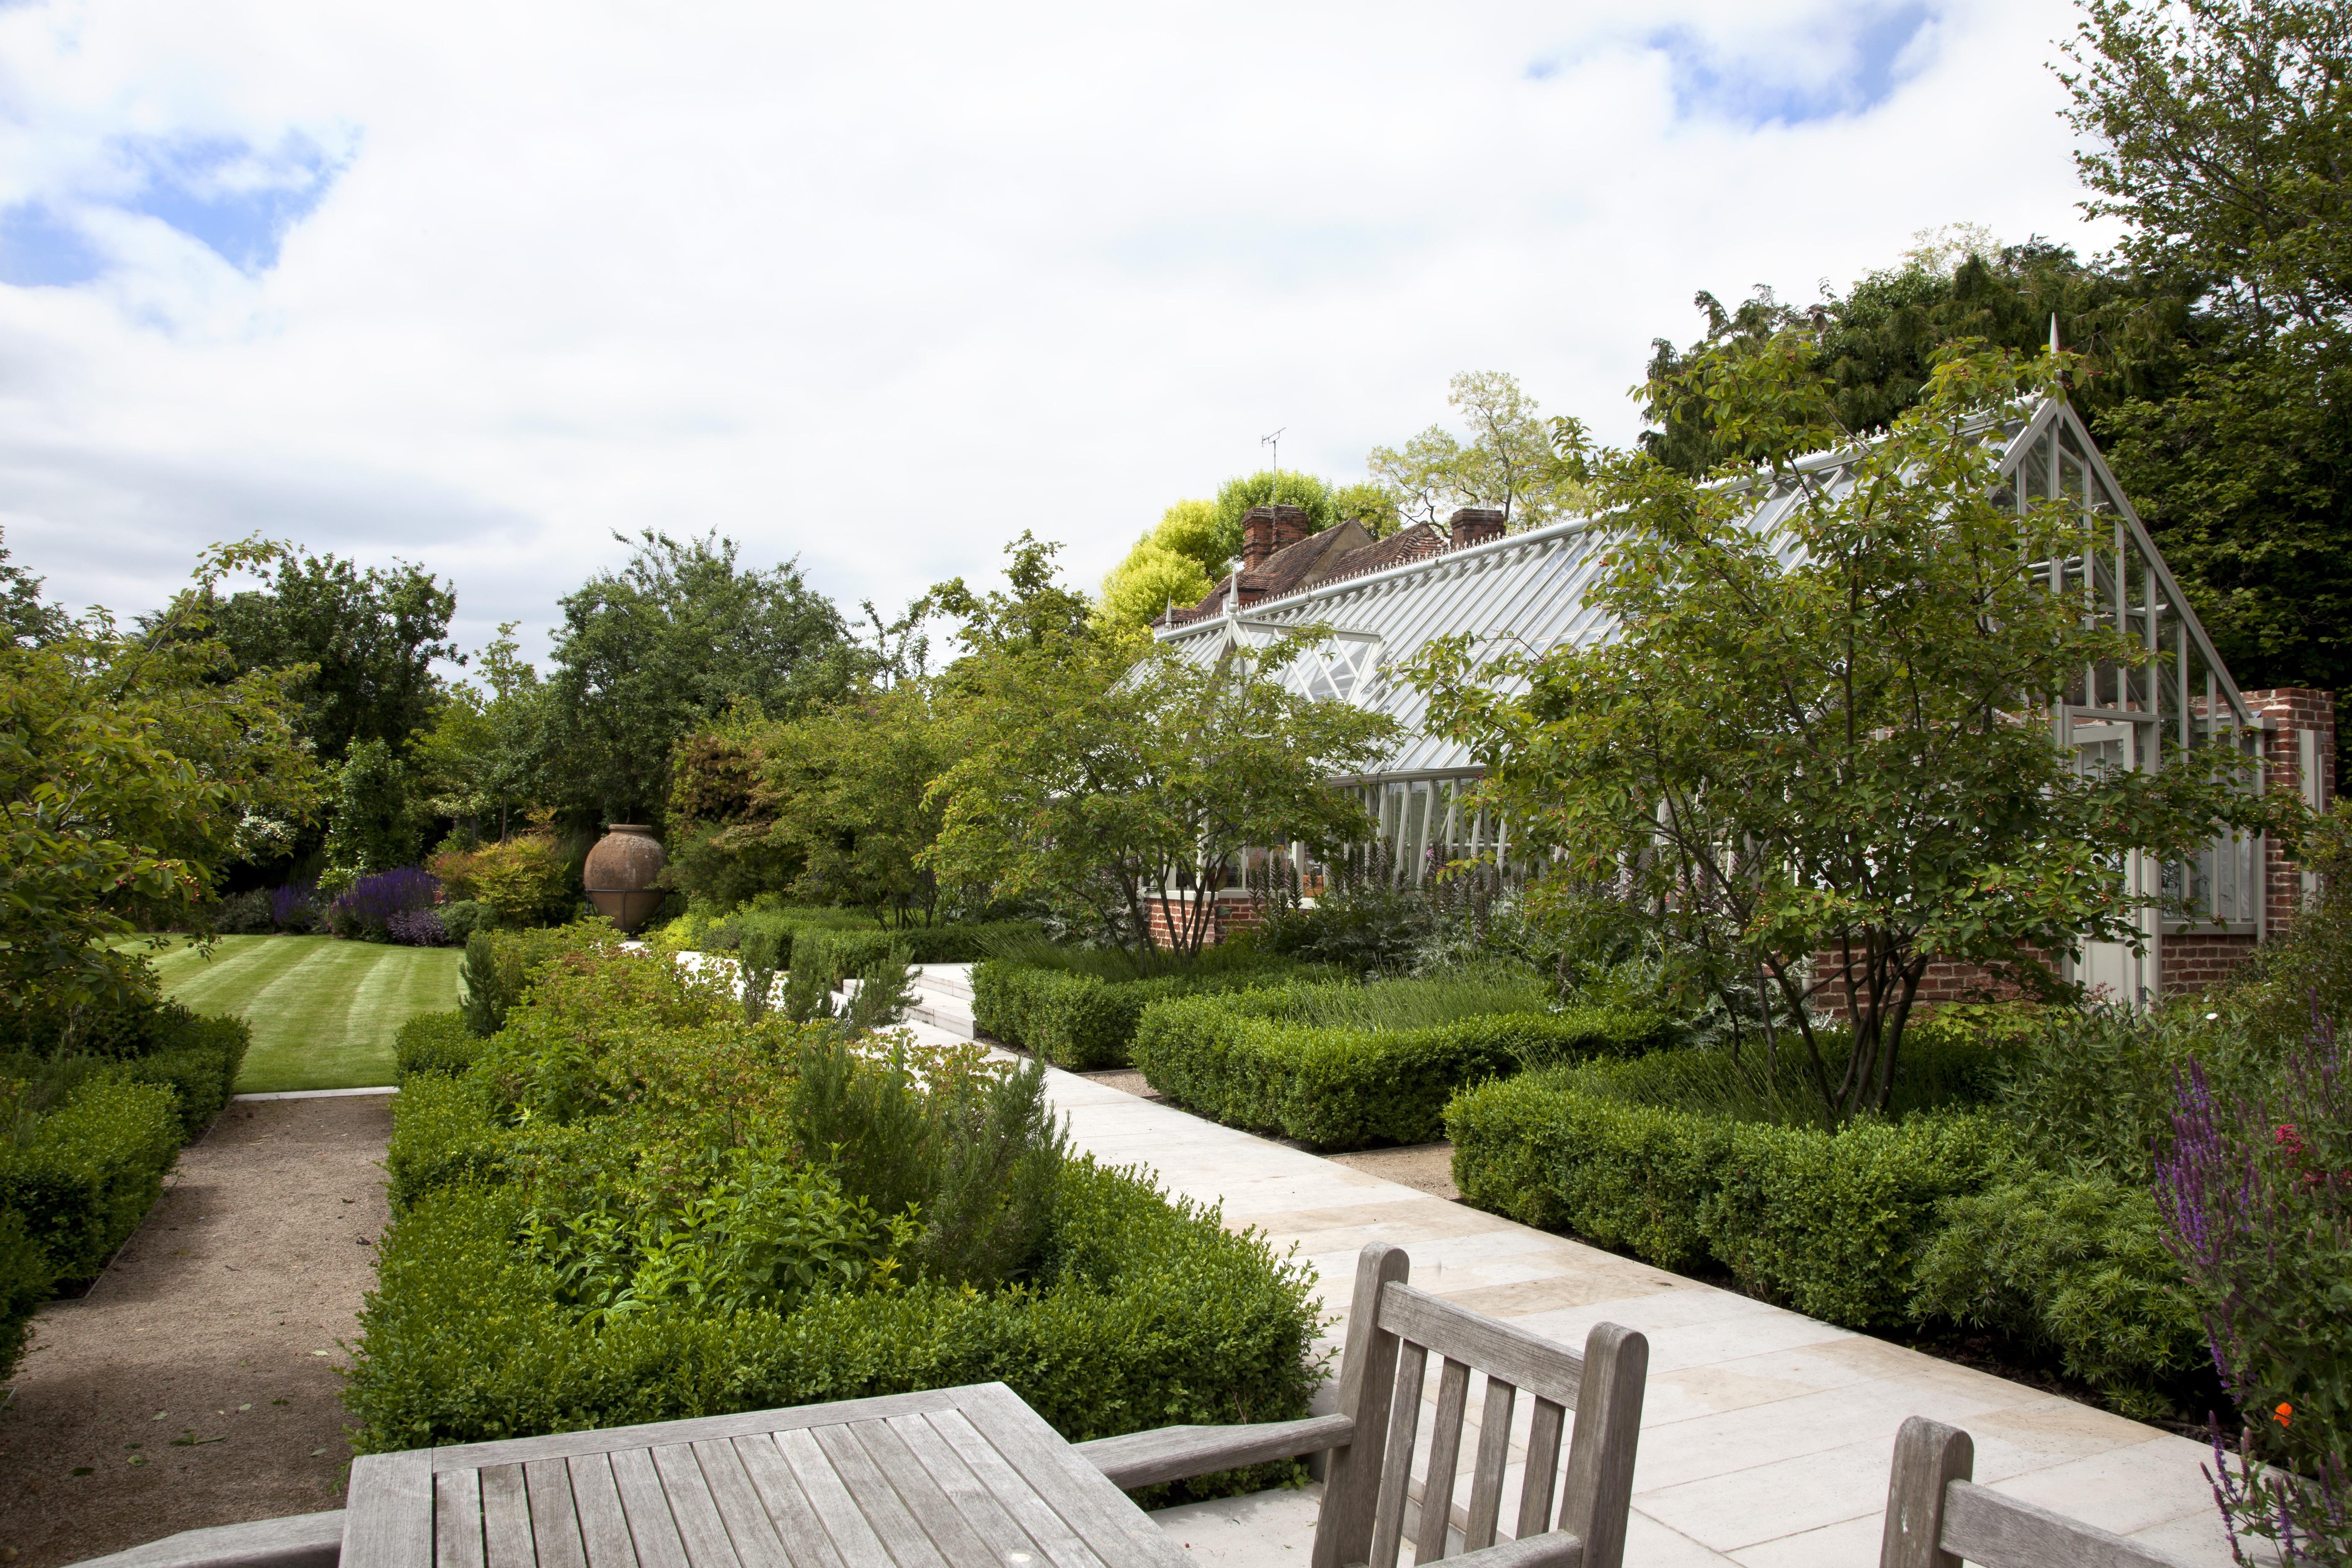 award winning garden design landscapers in kent winner of 5